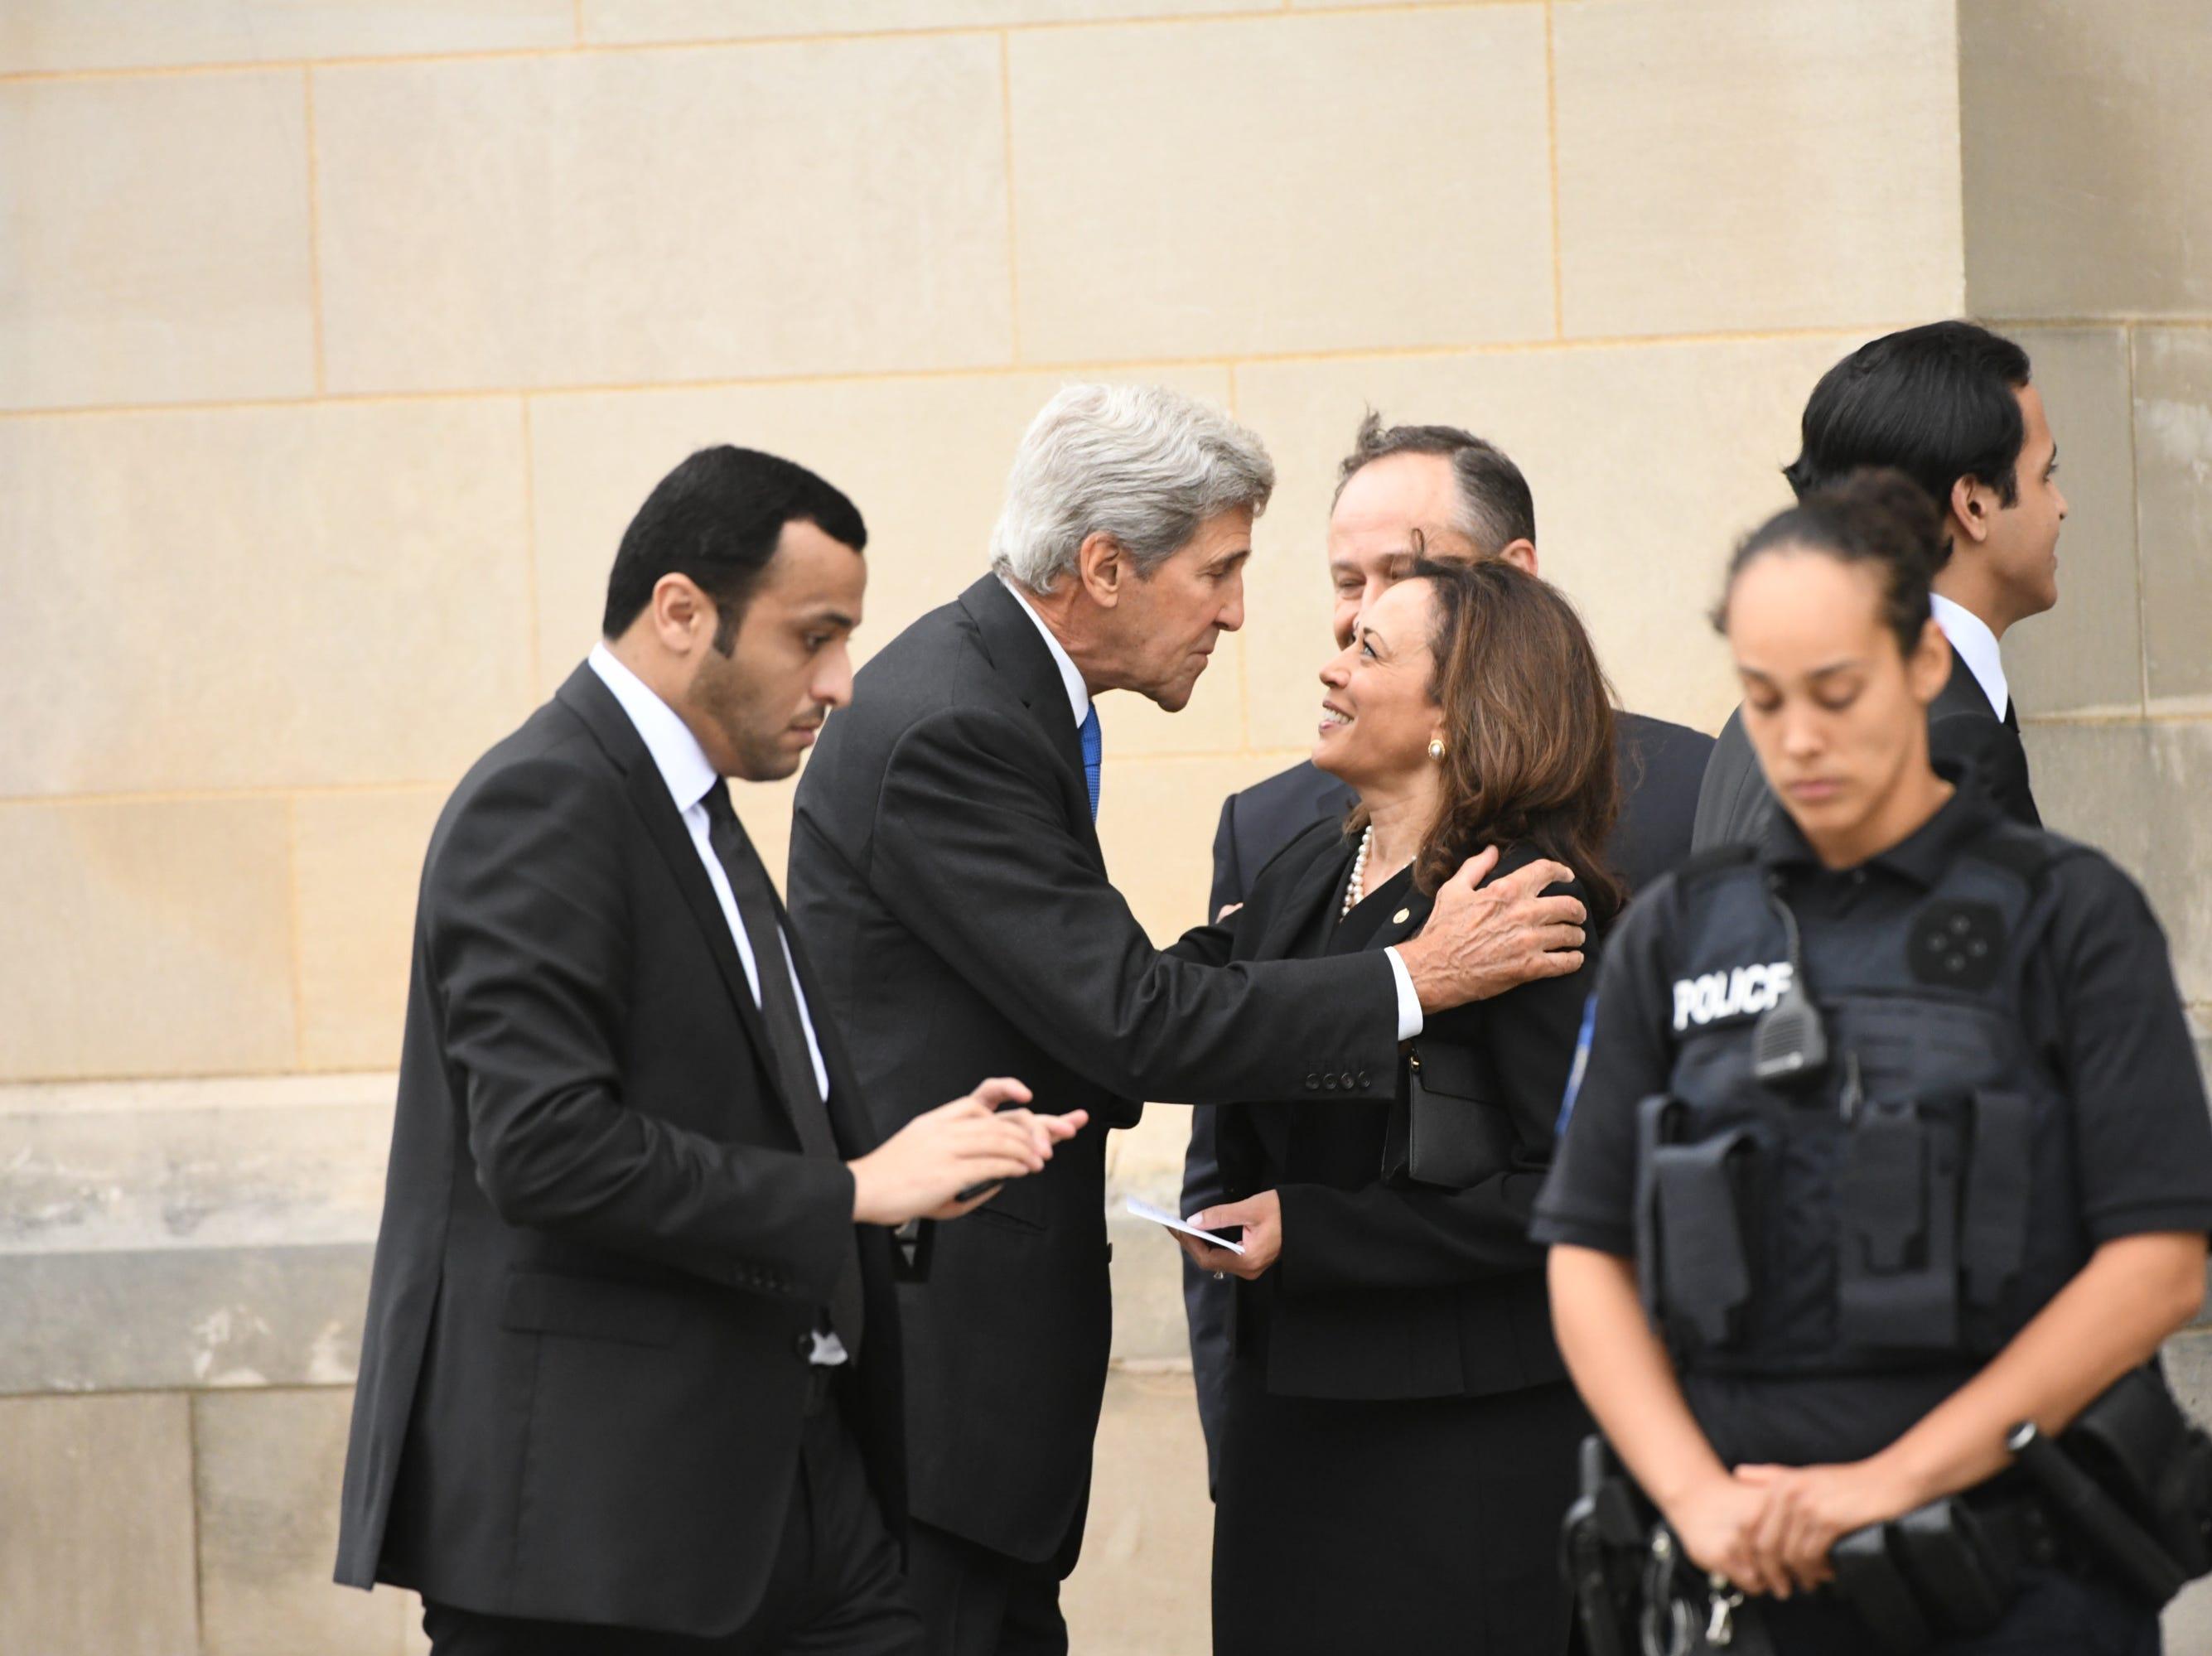 Former Secretary of State John Kerry greets and Senator Kamala Harris before the memorial service for John McCain, Saturday.